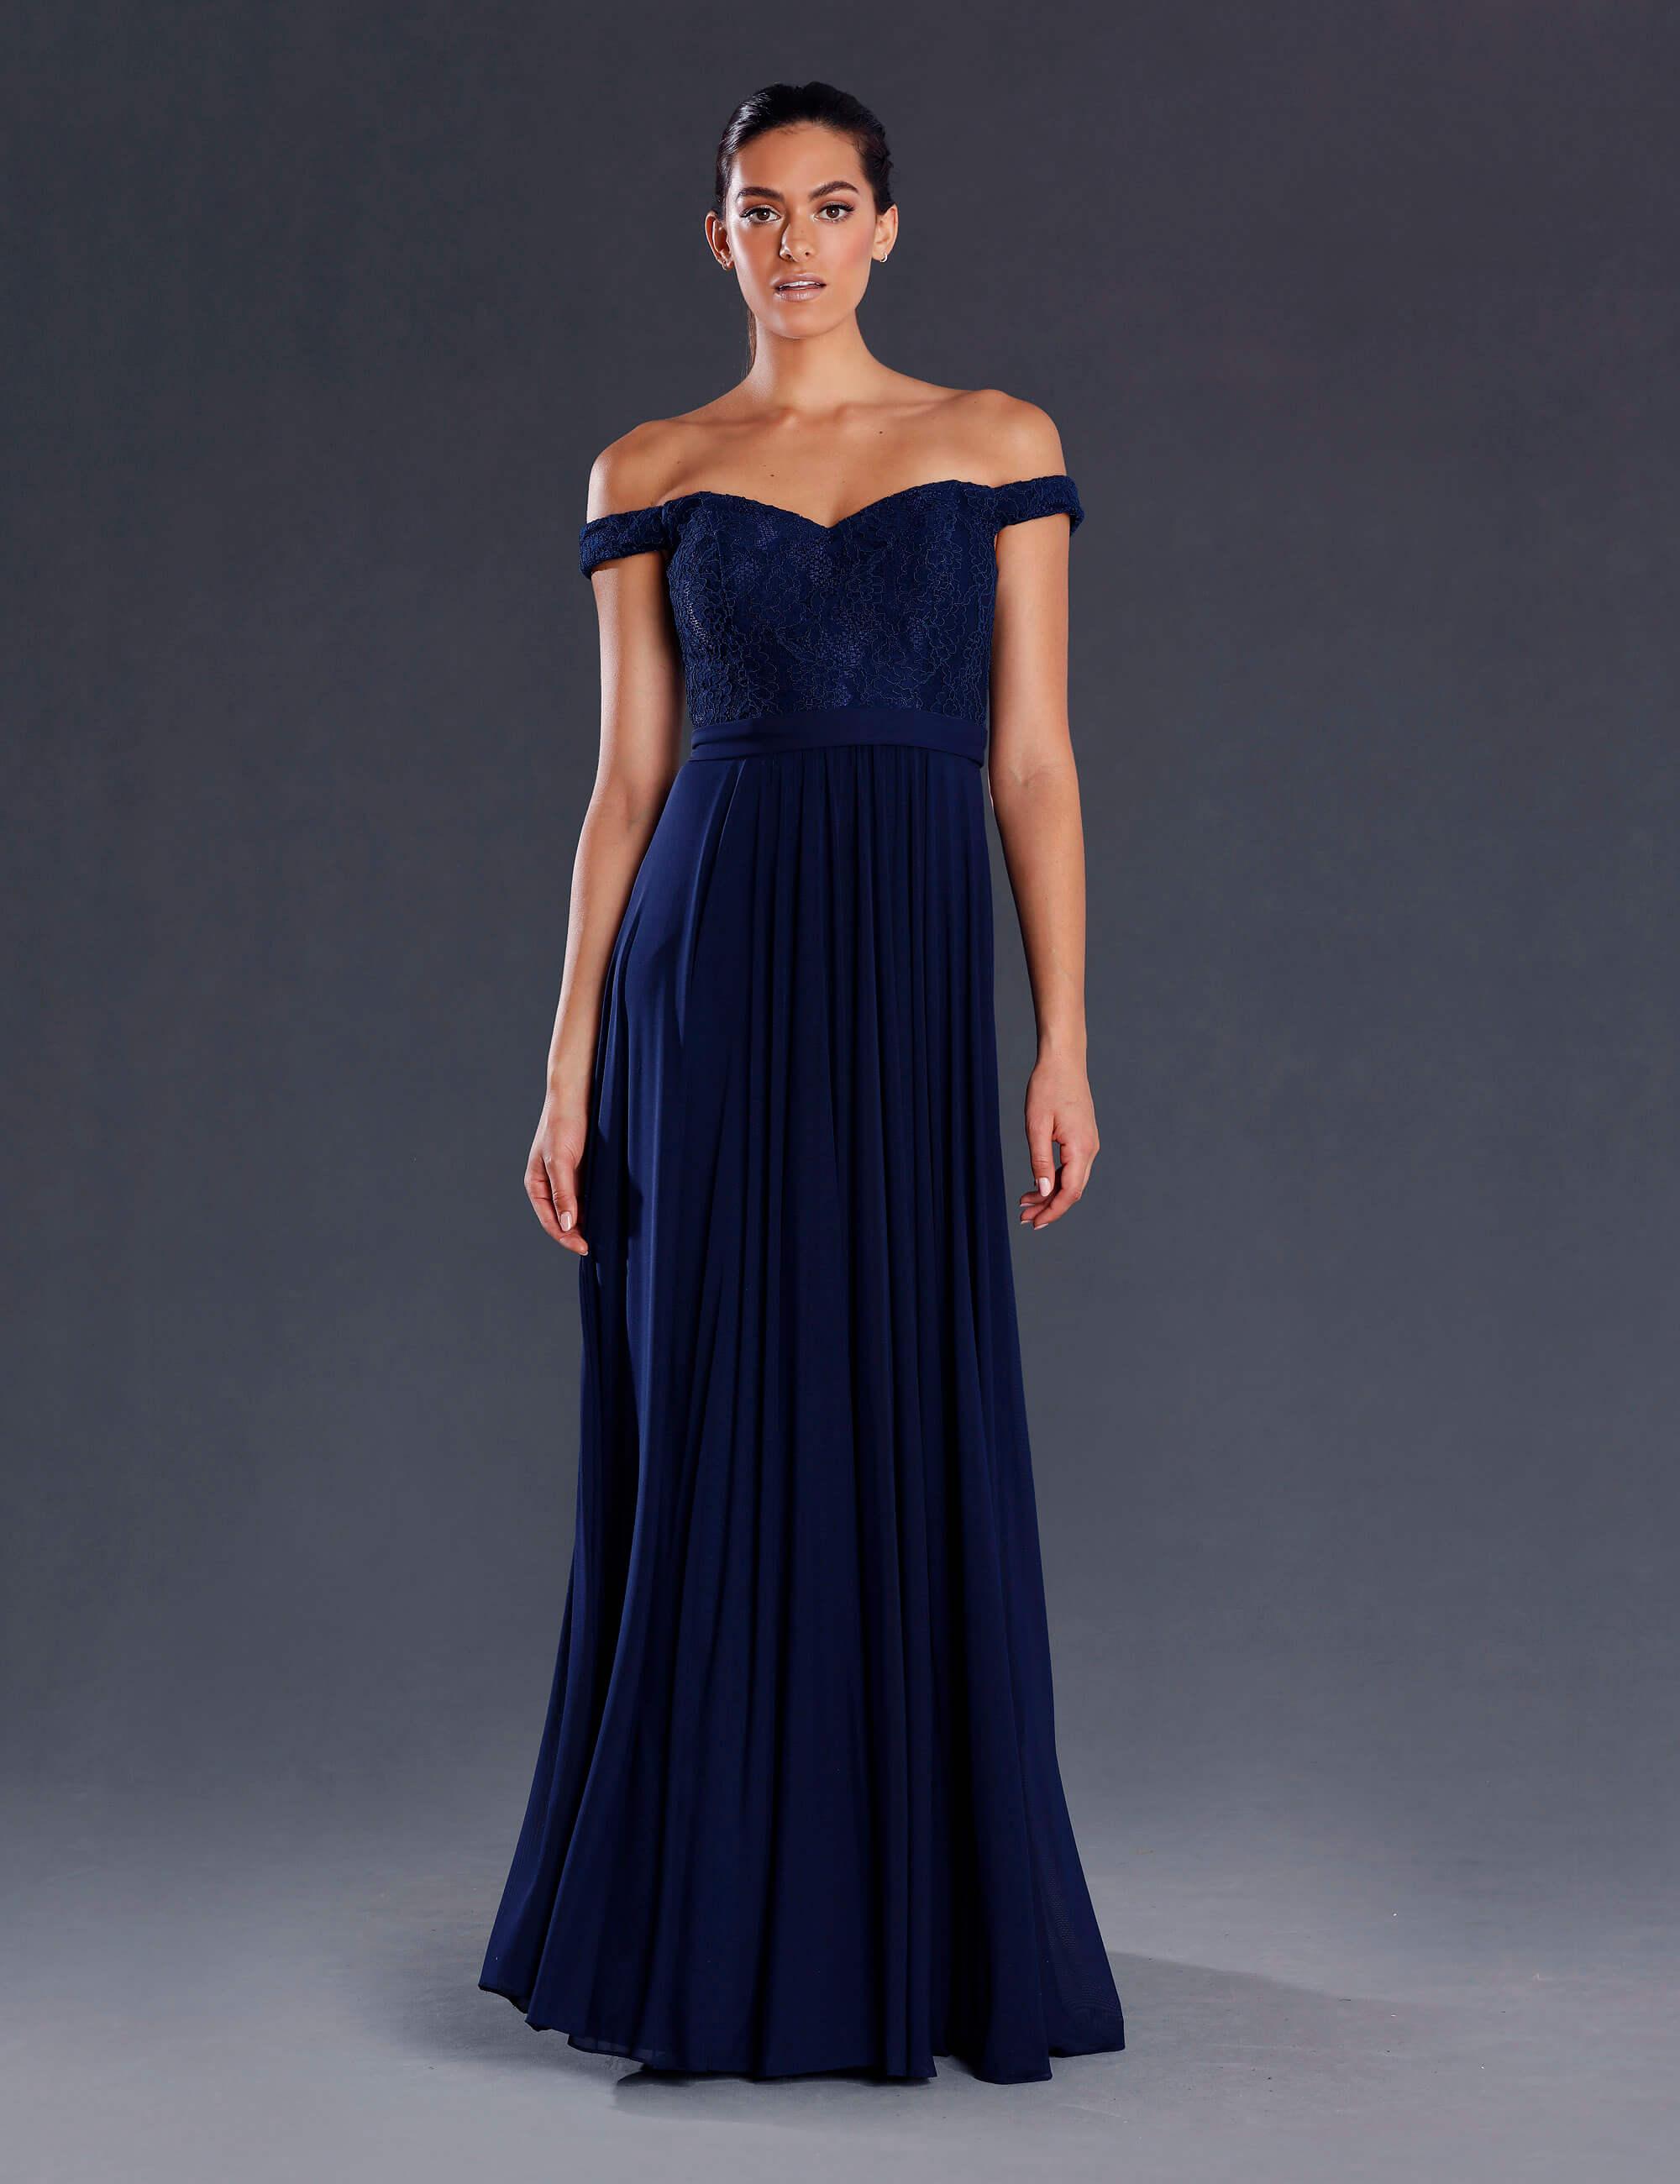 Bridesmaid dresses perth wa bridesmaid gowns perth bridesmaid jx002wine jx002navy ombrellifo Images